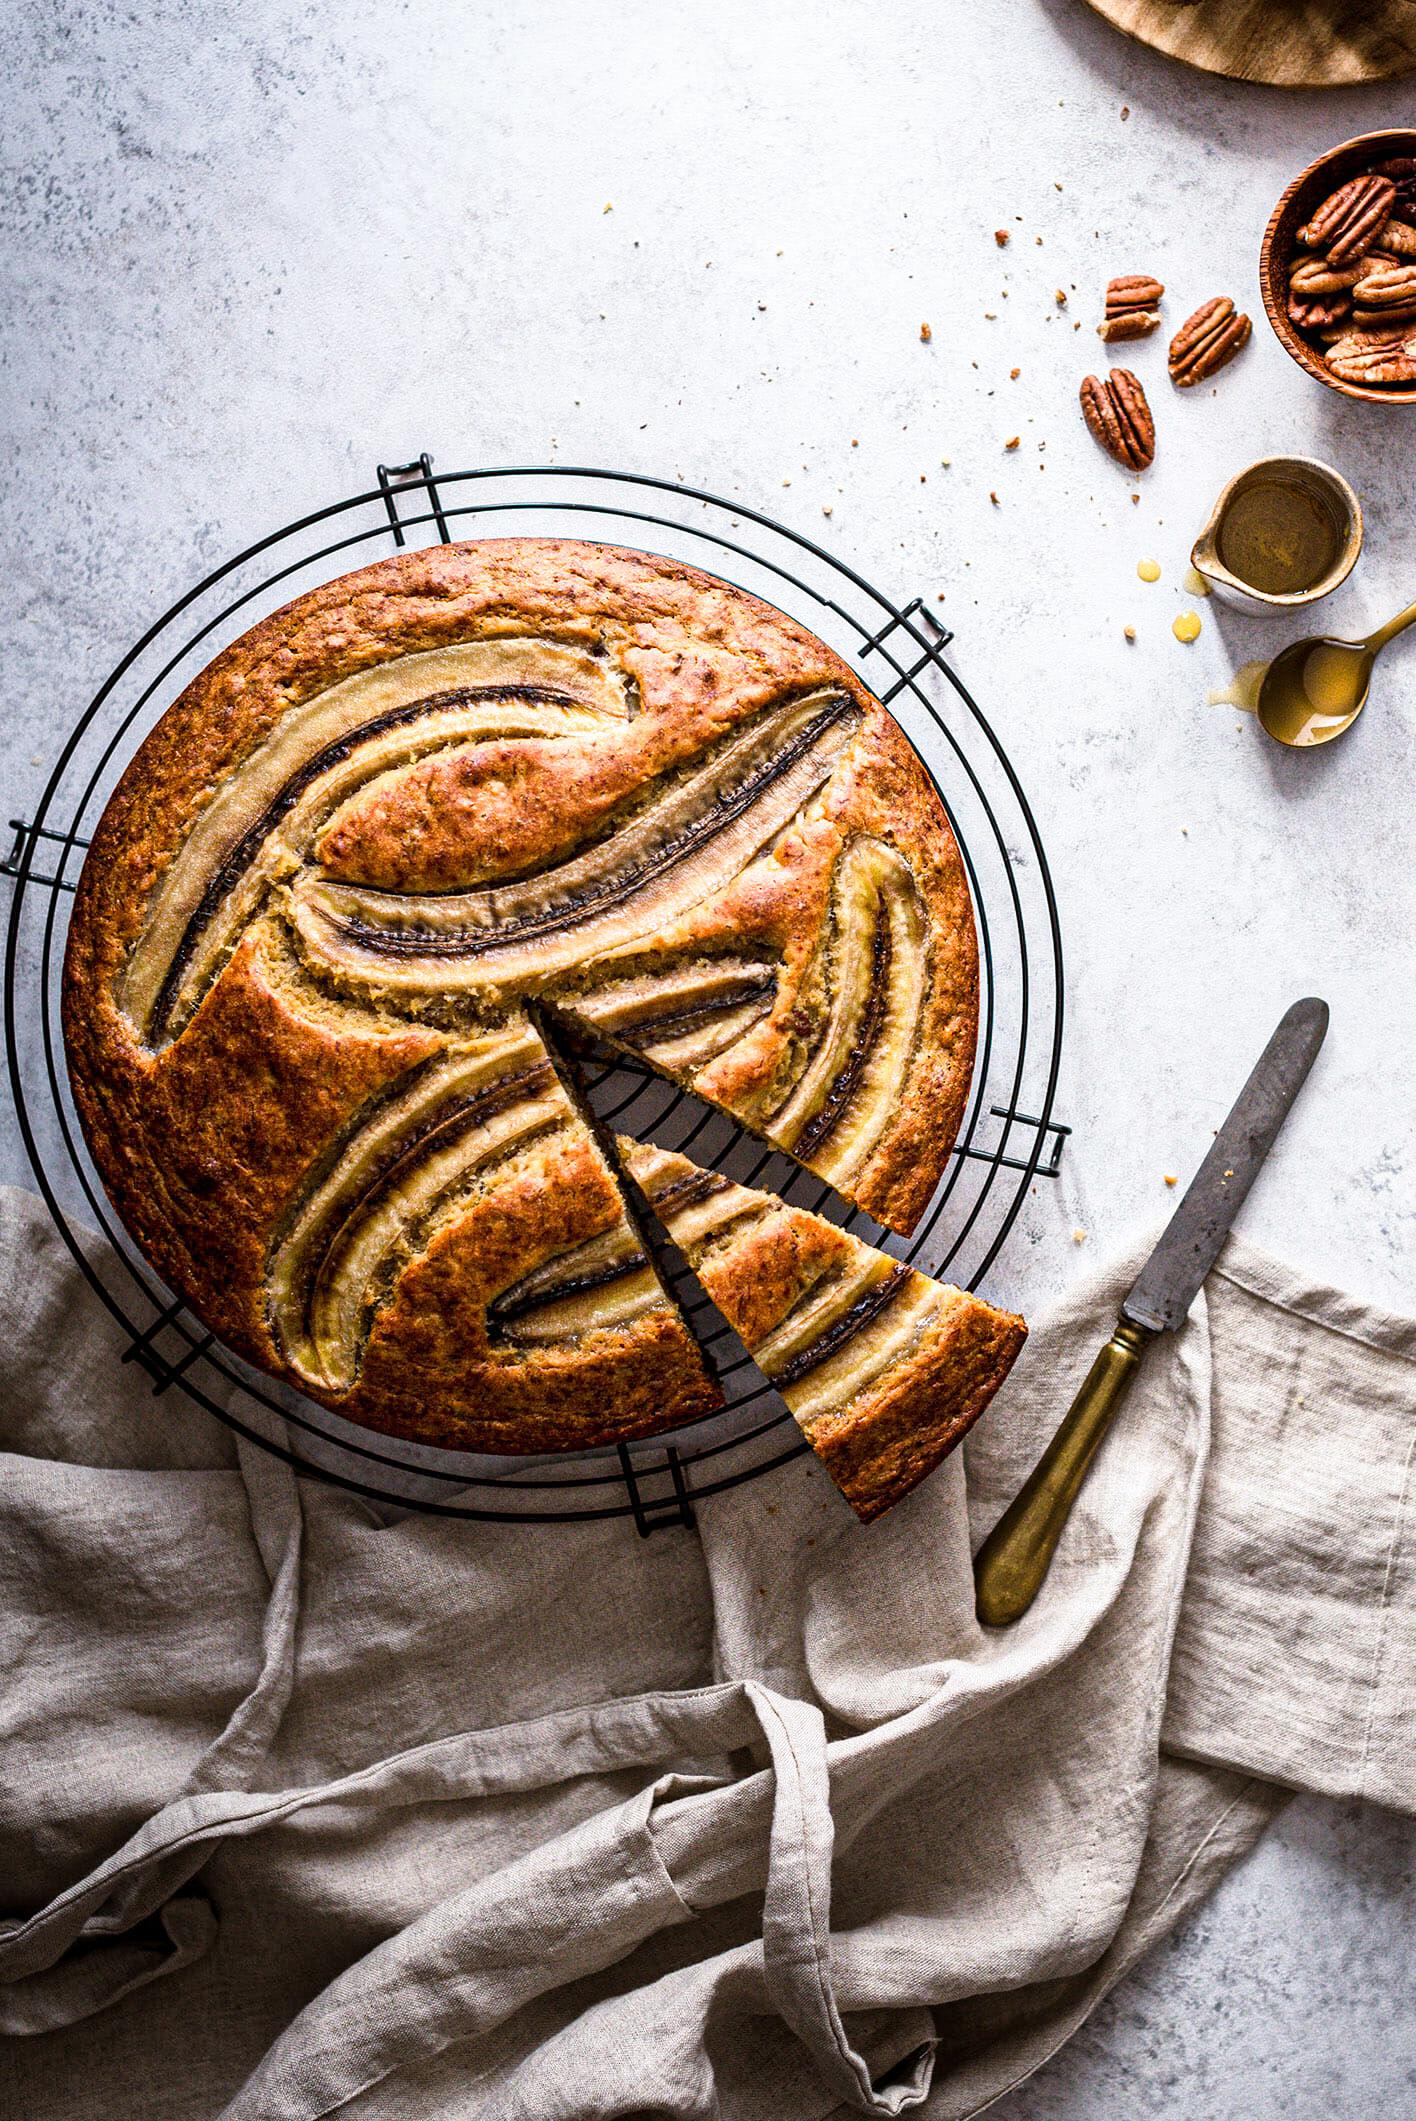 Recette gâteau banane - Lilie Bakery